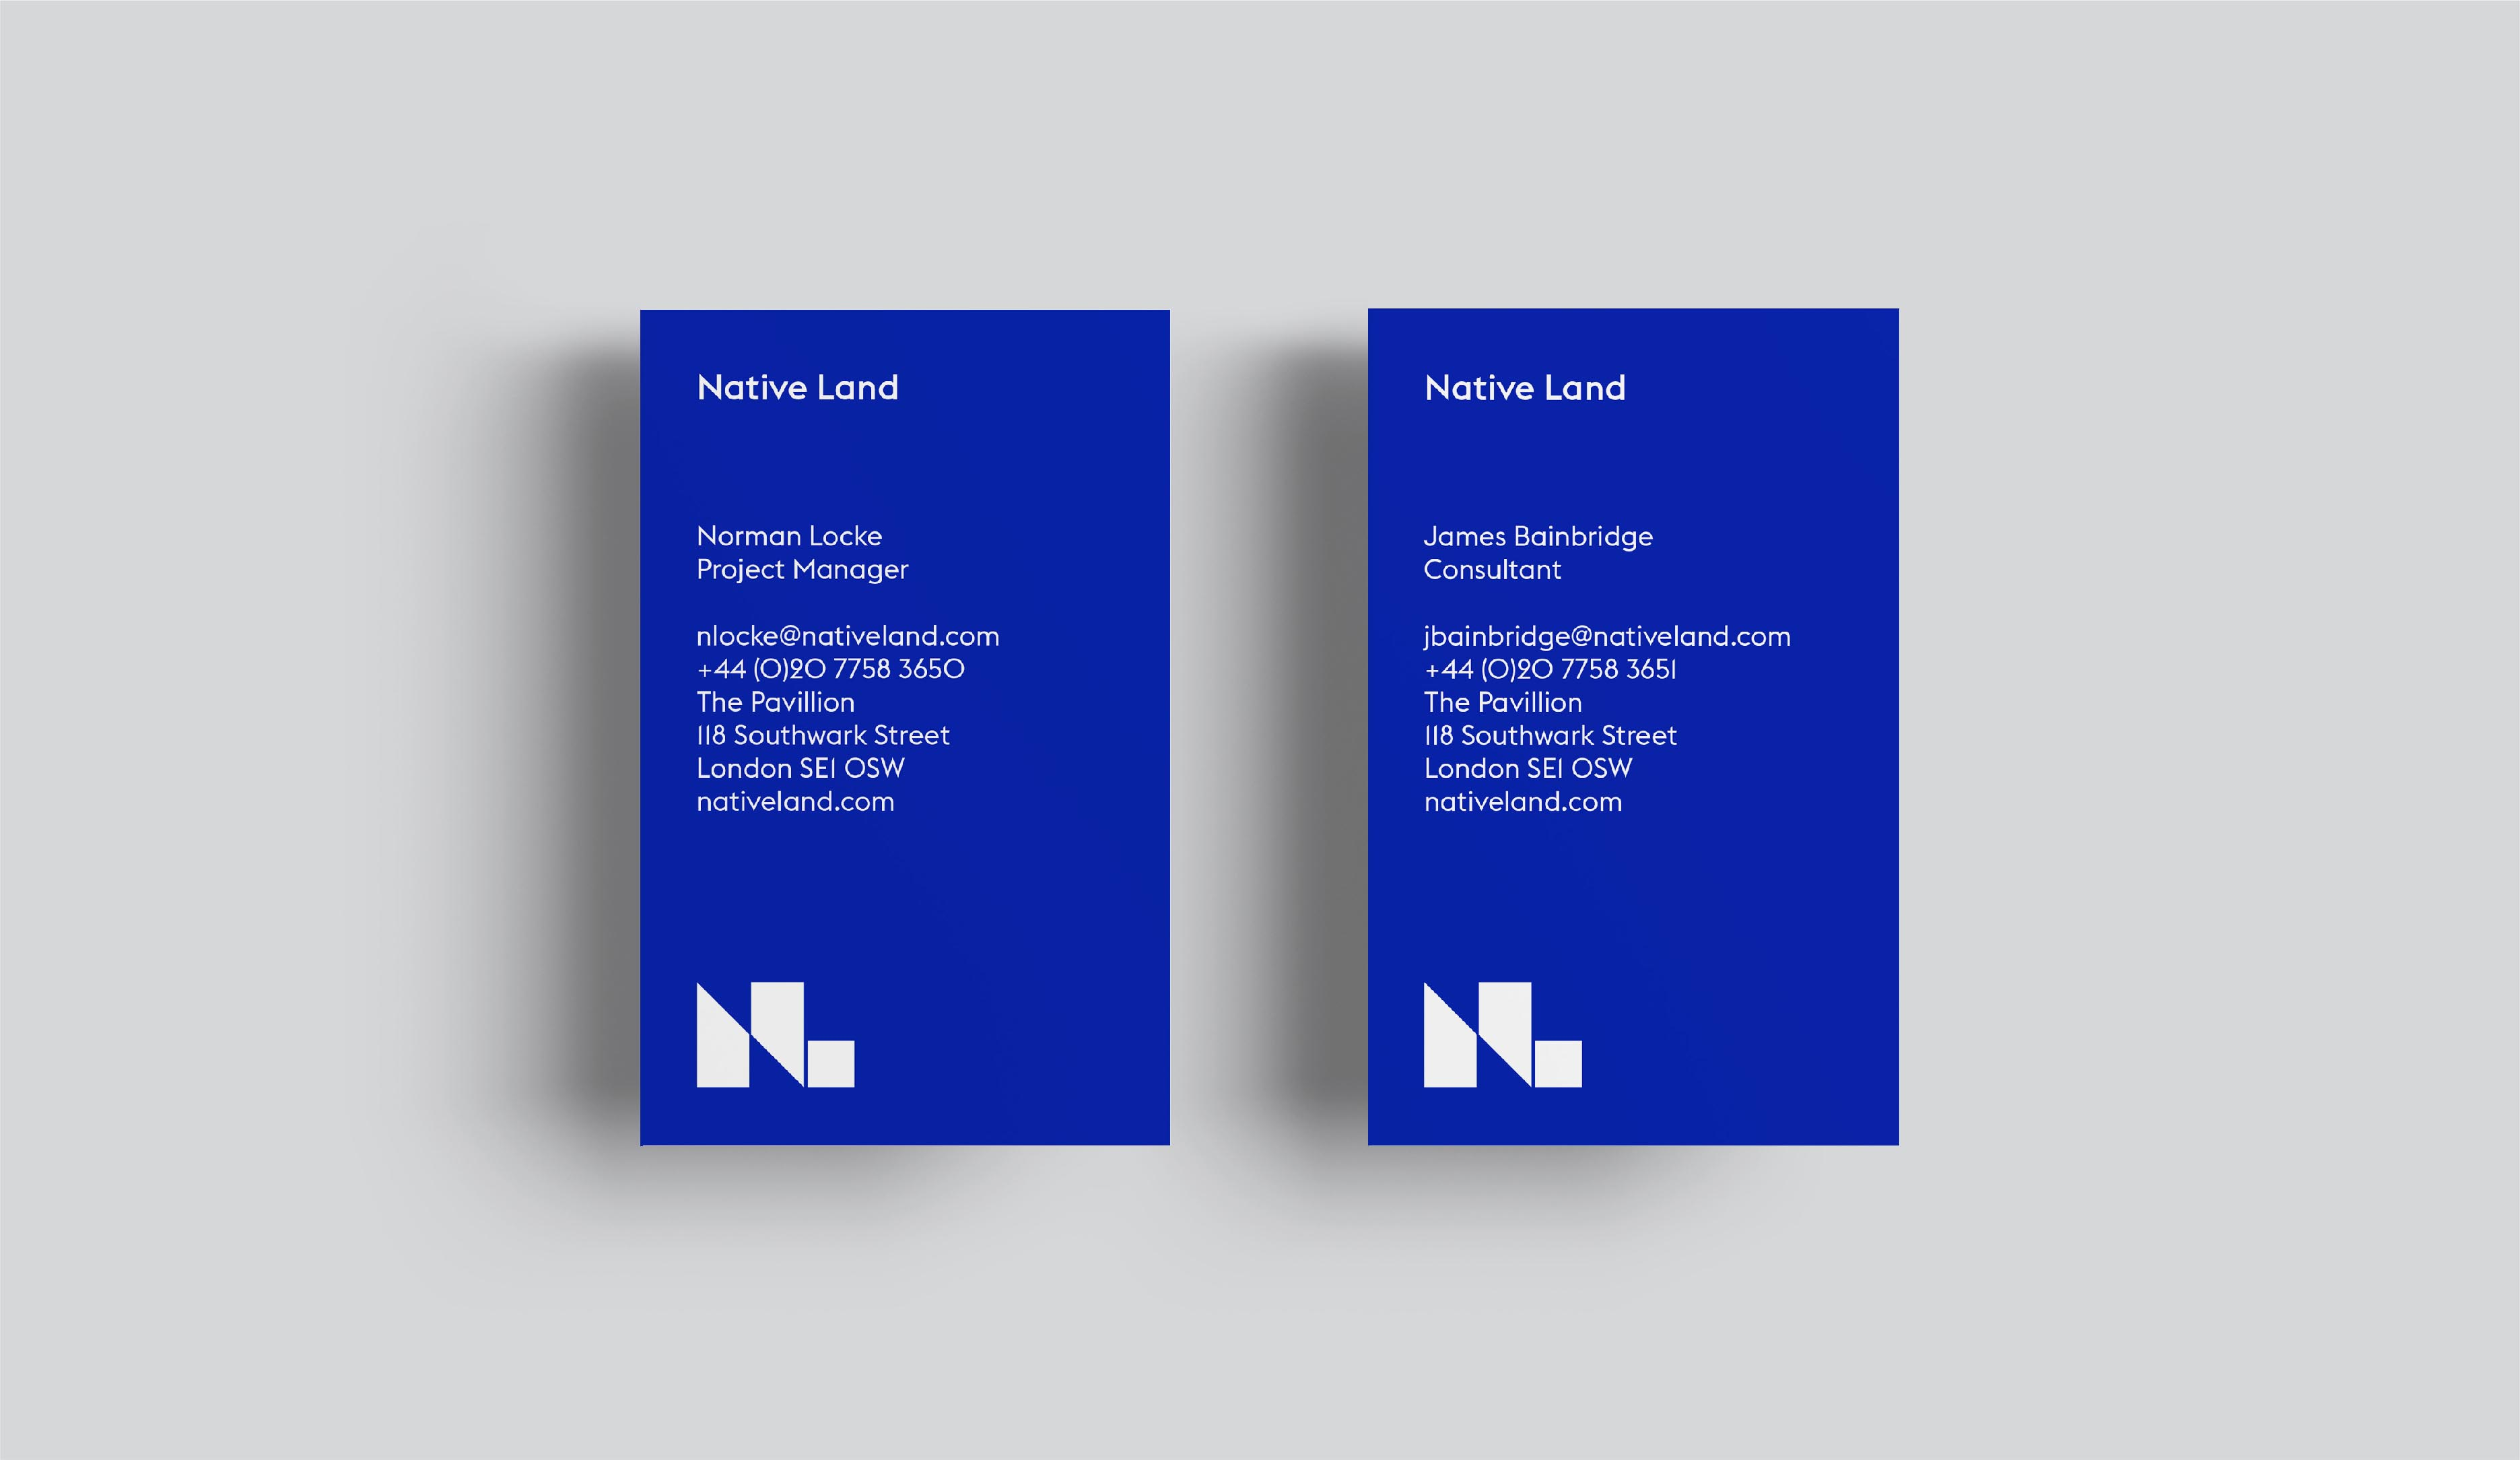 Native Land property development brand identity